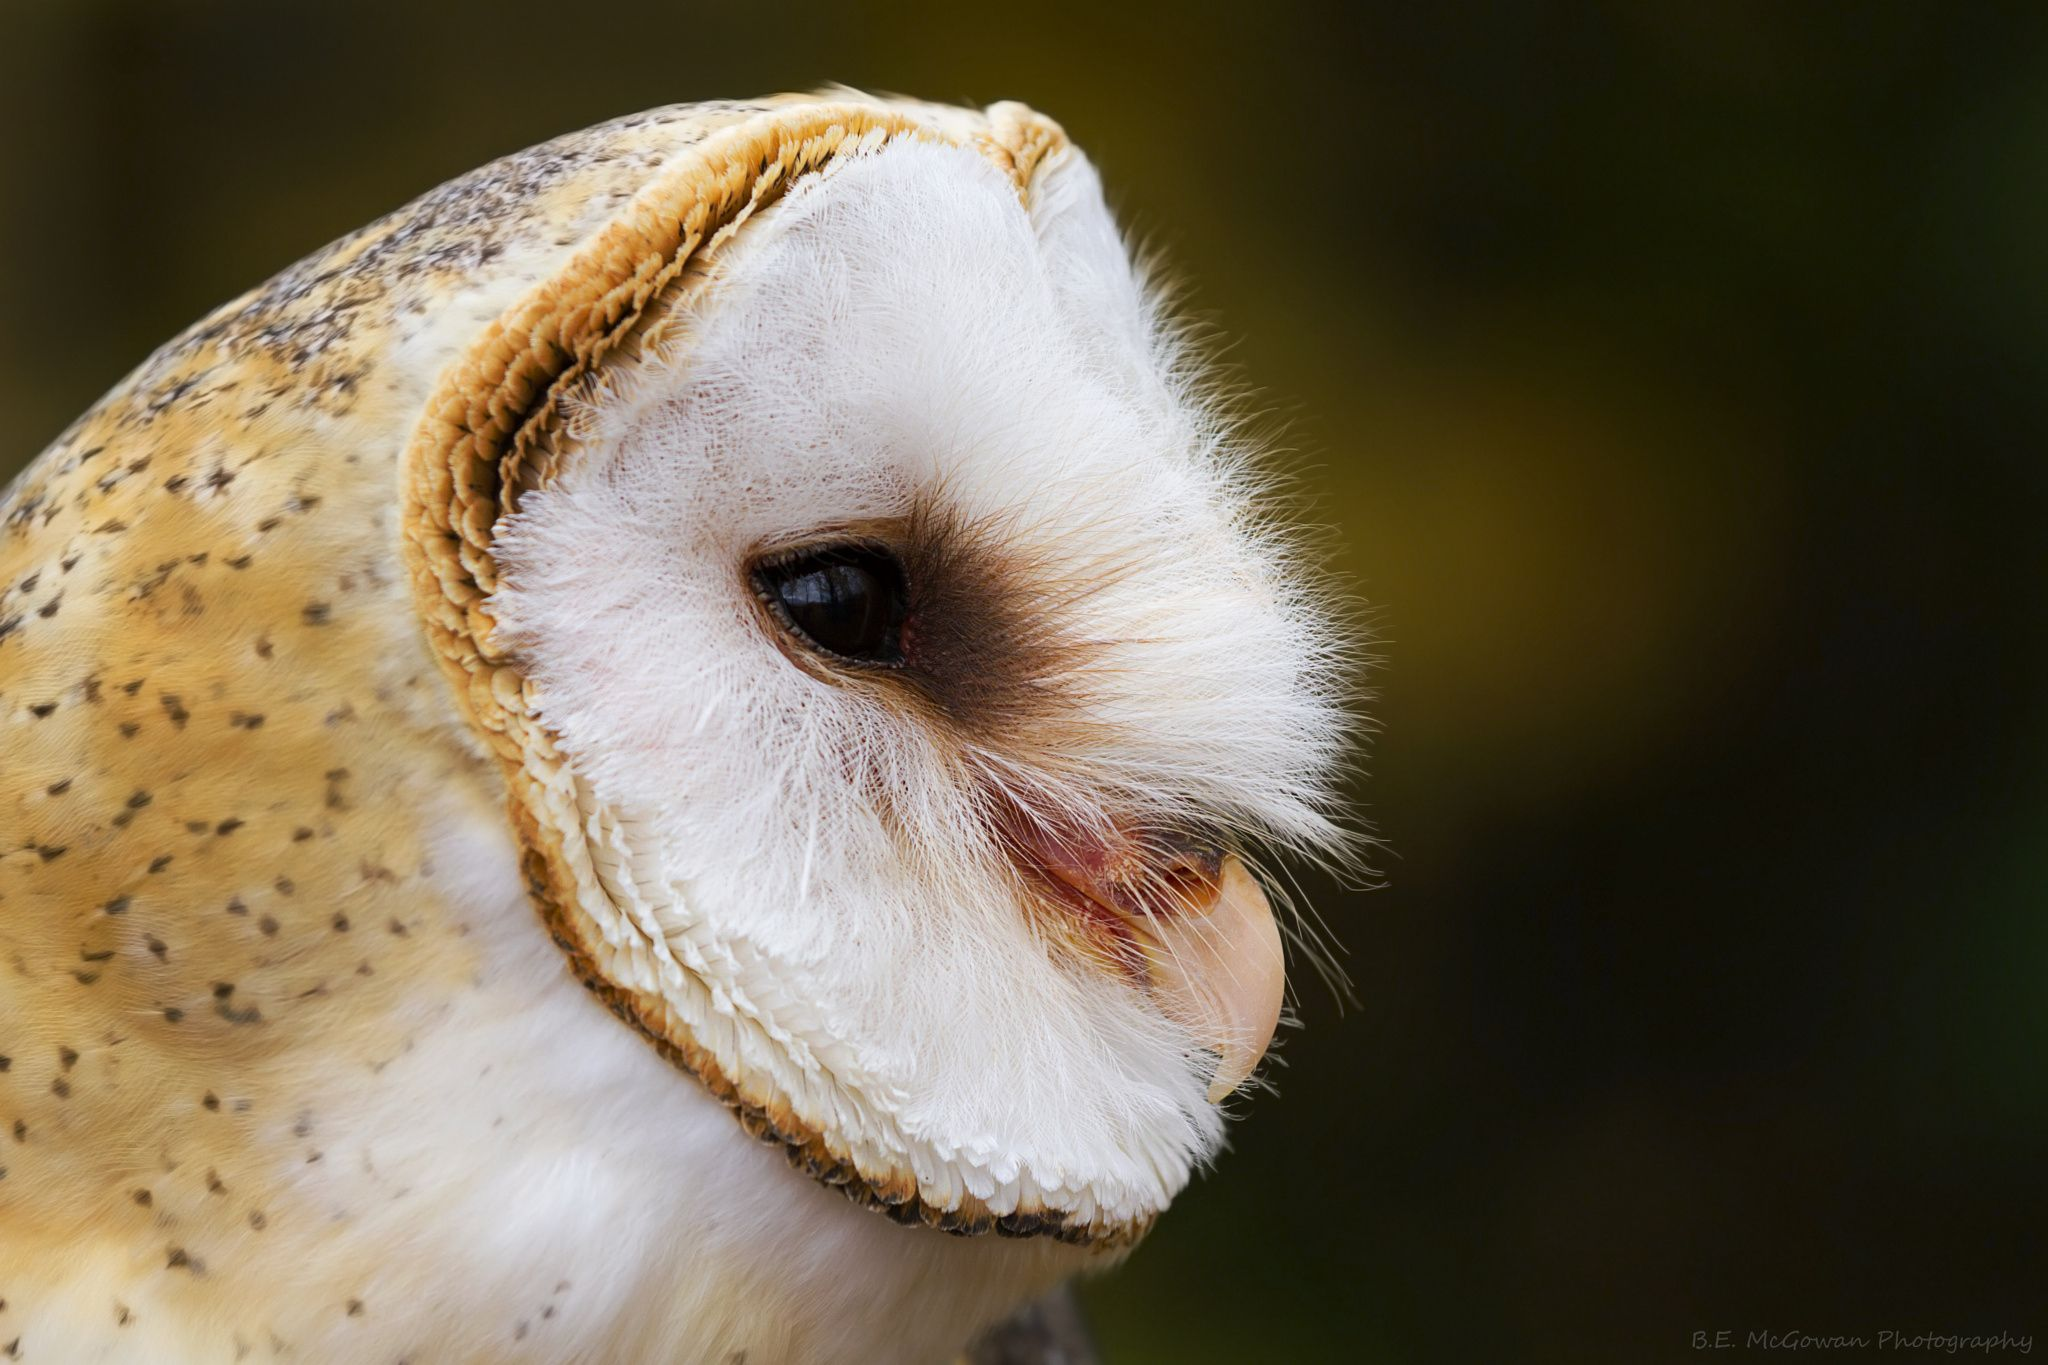 profile of Shadow the barn owl by Bryan McGowan